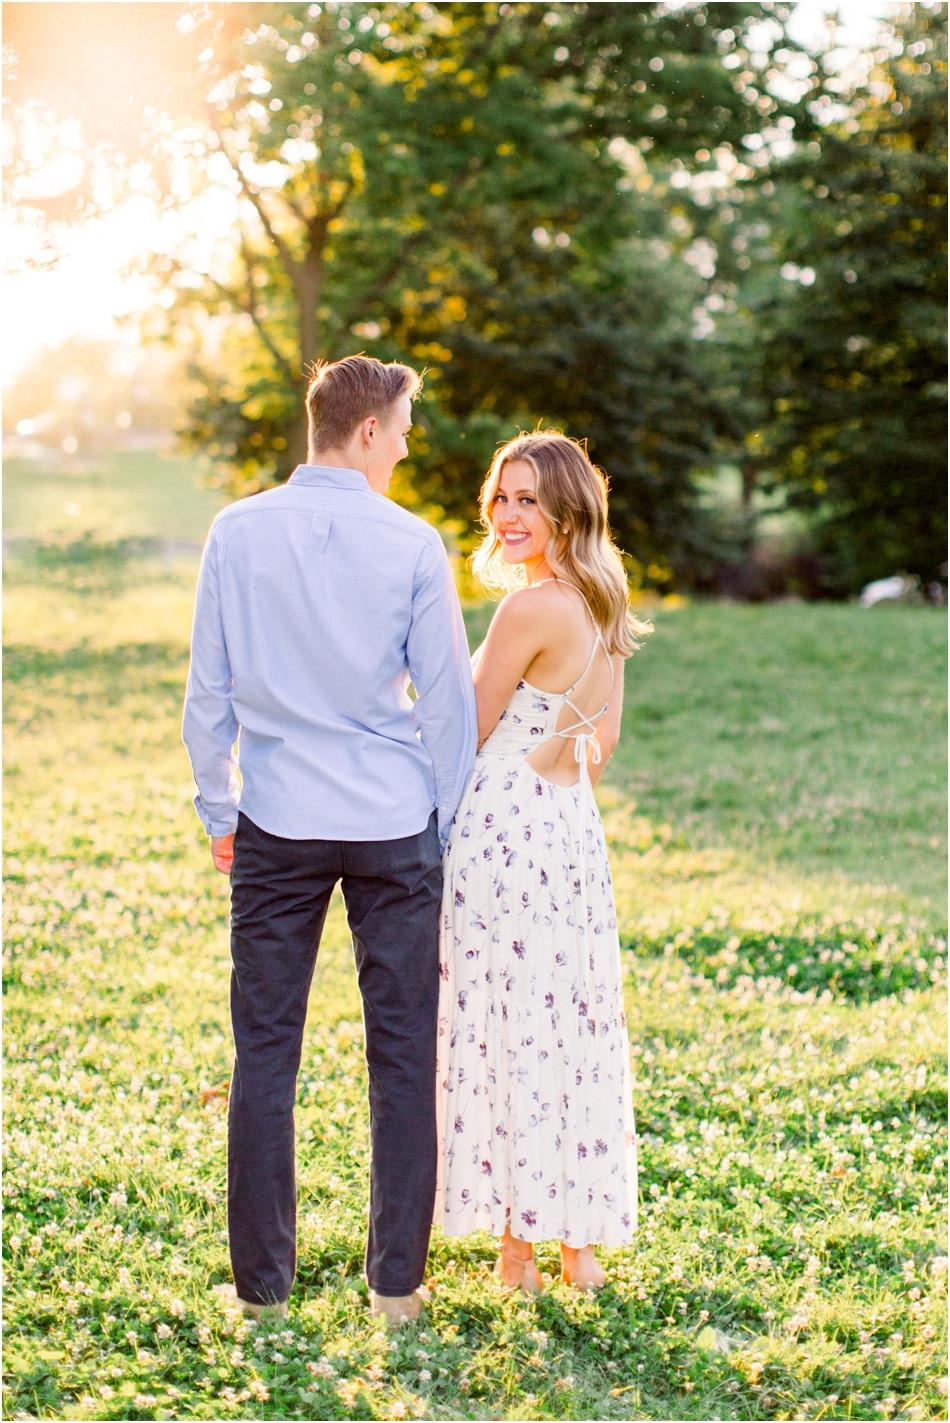 Romantic-Sunset-Engagement-Photos